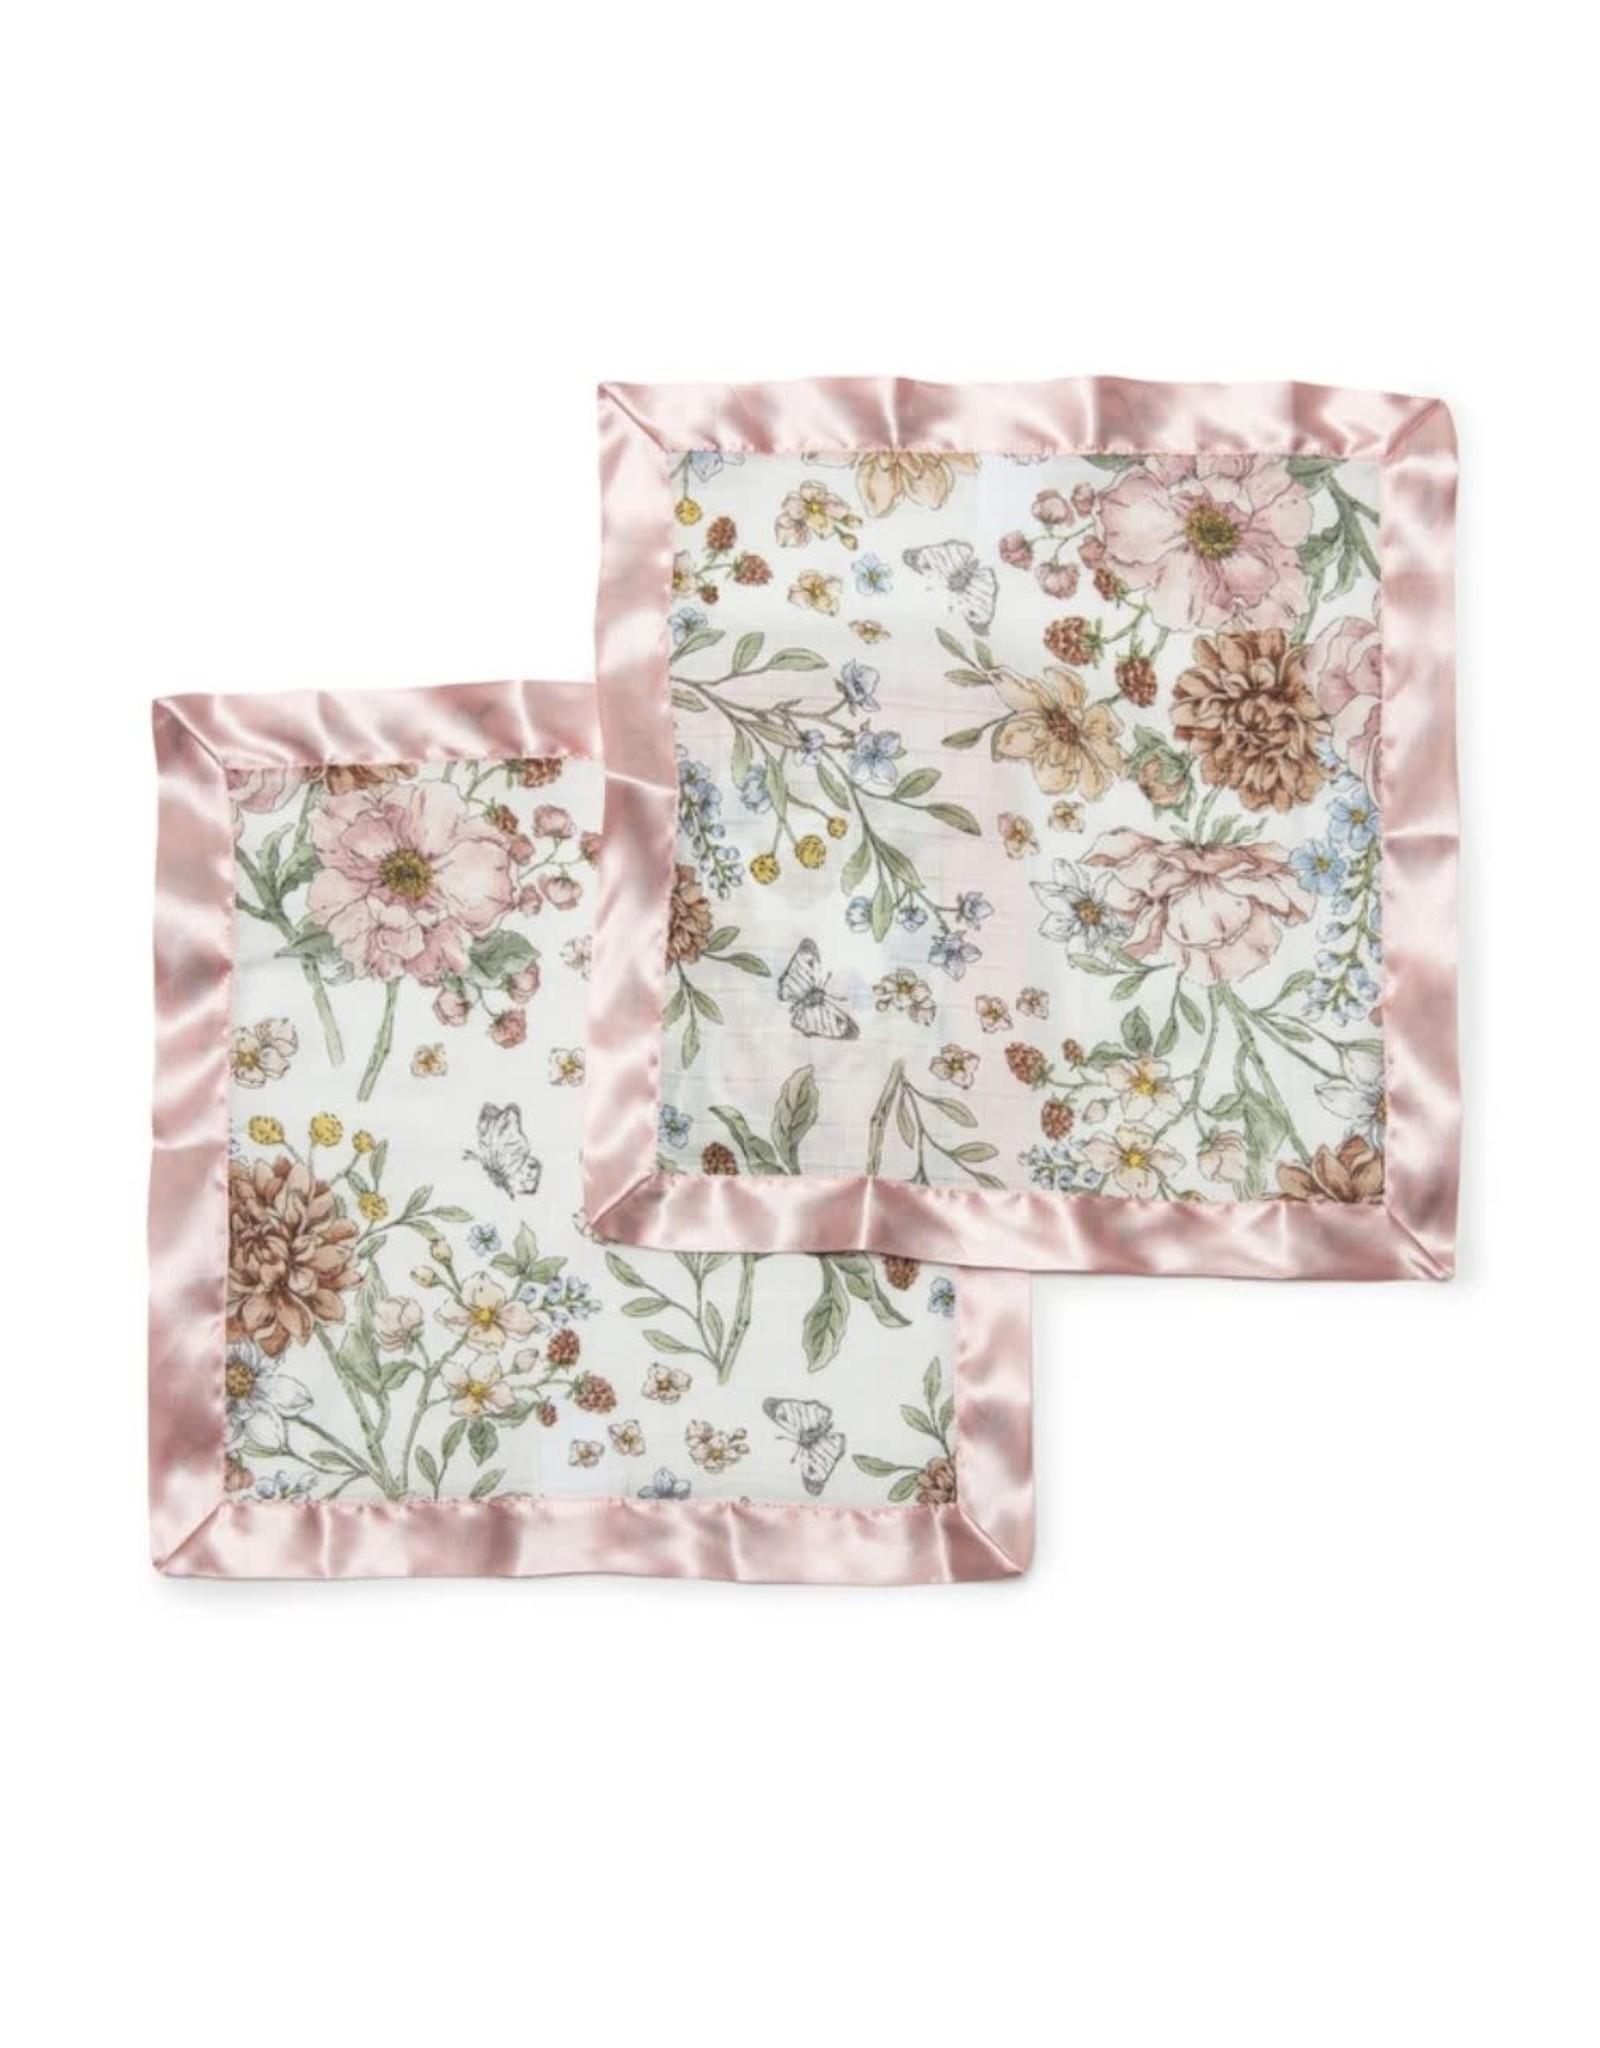 Loulou Lollipop Secret Garden Security Blankets - 2 Pack